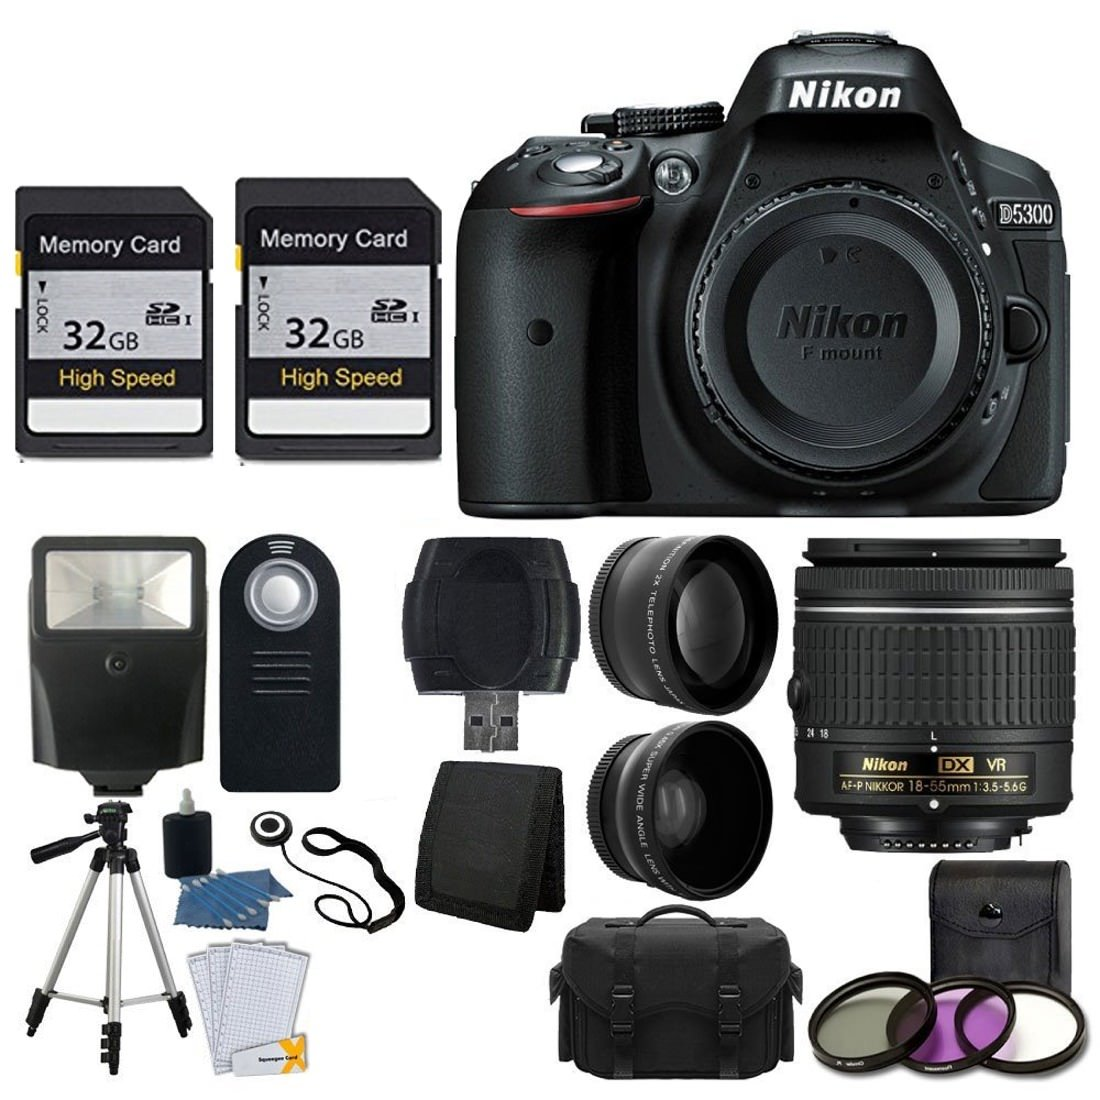 Nikon D5300 DSLR Camera + Nikon 18-55mm VR AF-P Lens + 64GB Memory Card + Telephoto & Wide Angle Lens + Wireless Remote + Flash + Valued KIT